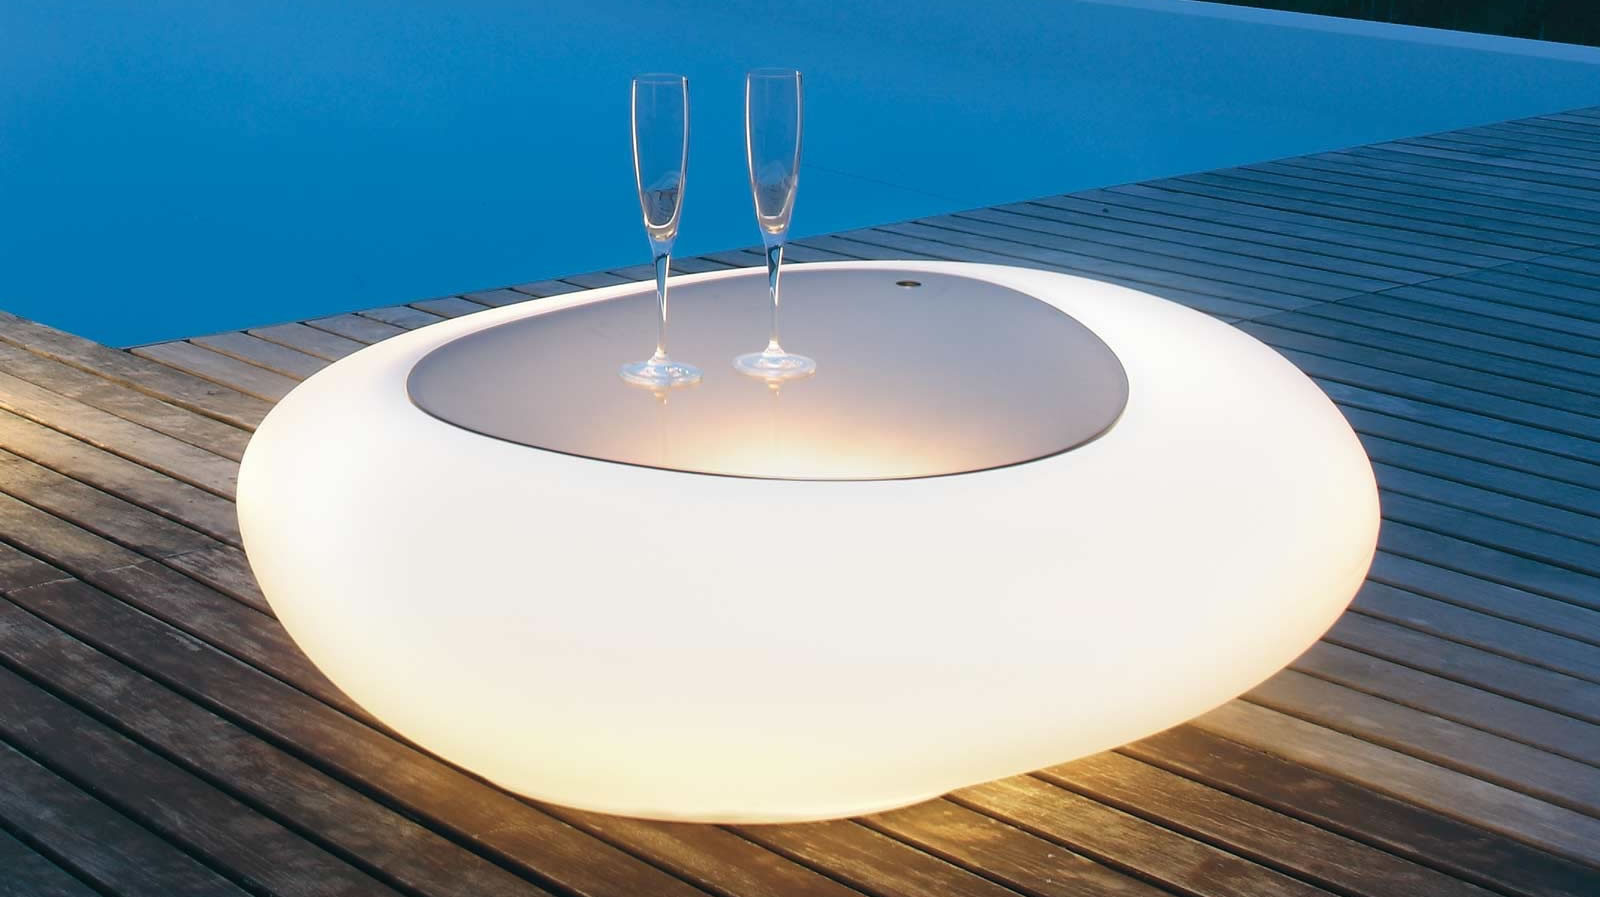 Tonin Casa unveils its stylish new illuminated Kos coffee tables -